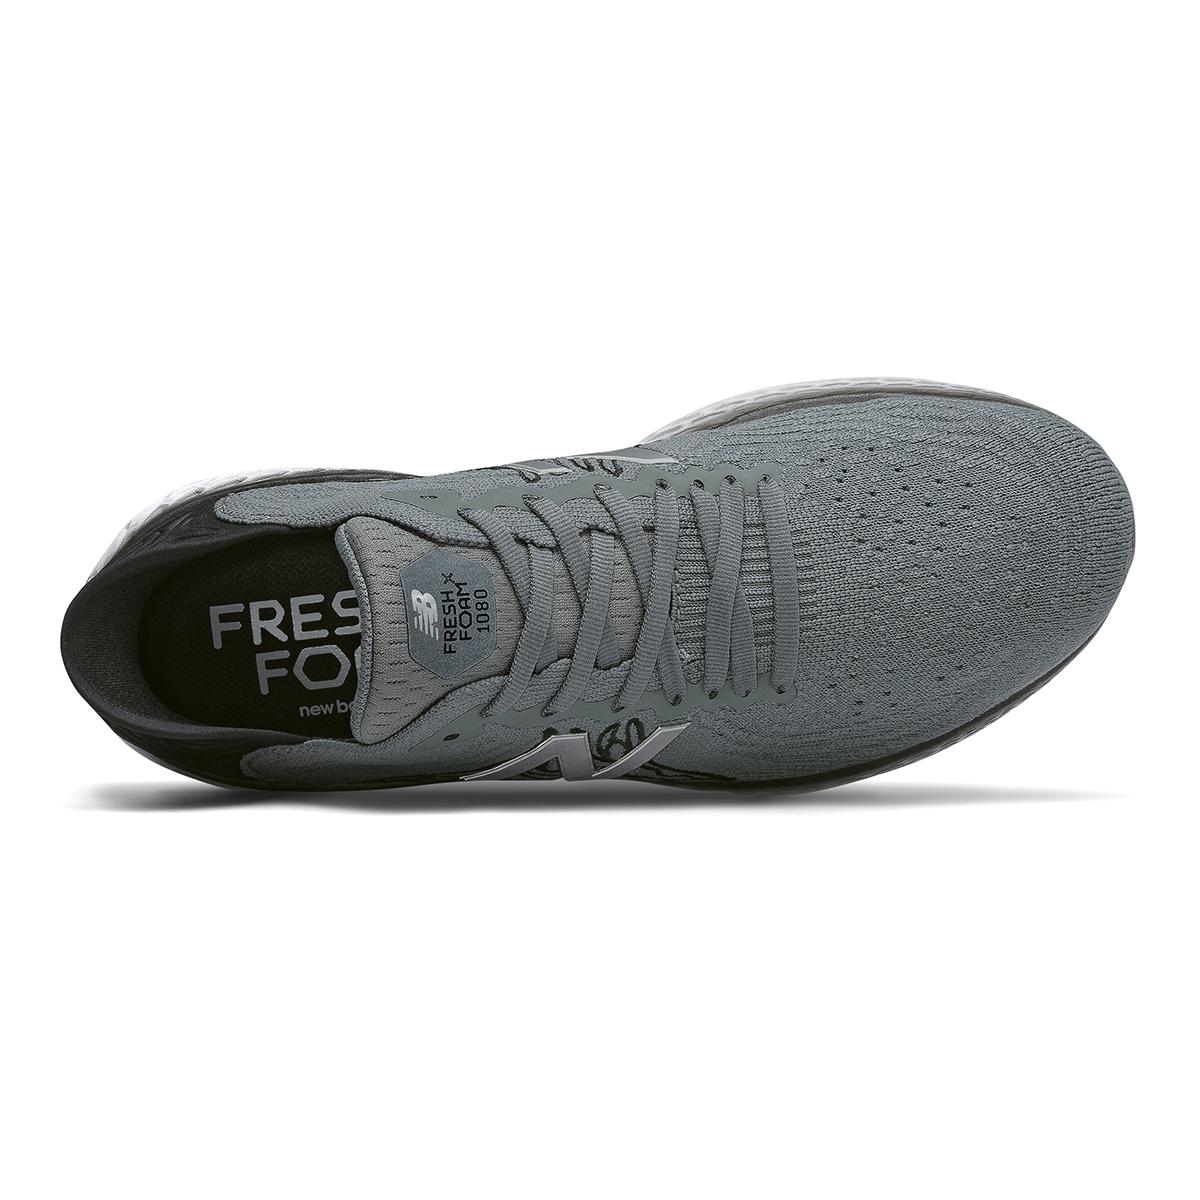 Men's New Balance Fresh Foam 1080v10 Running Shoe - Color: Lead - Size: 7 - Width: Wide, Lead, large, image 3